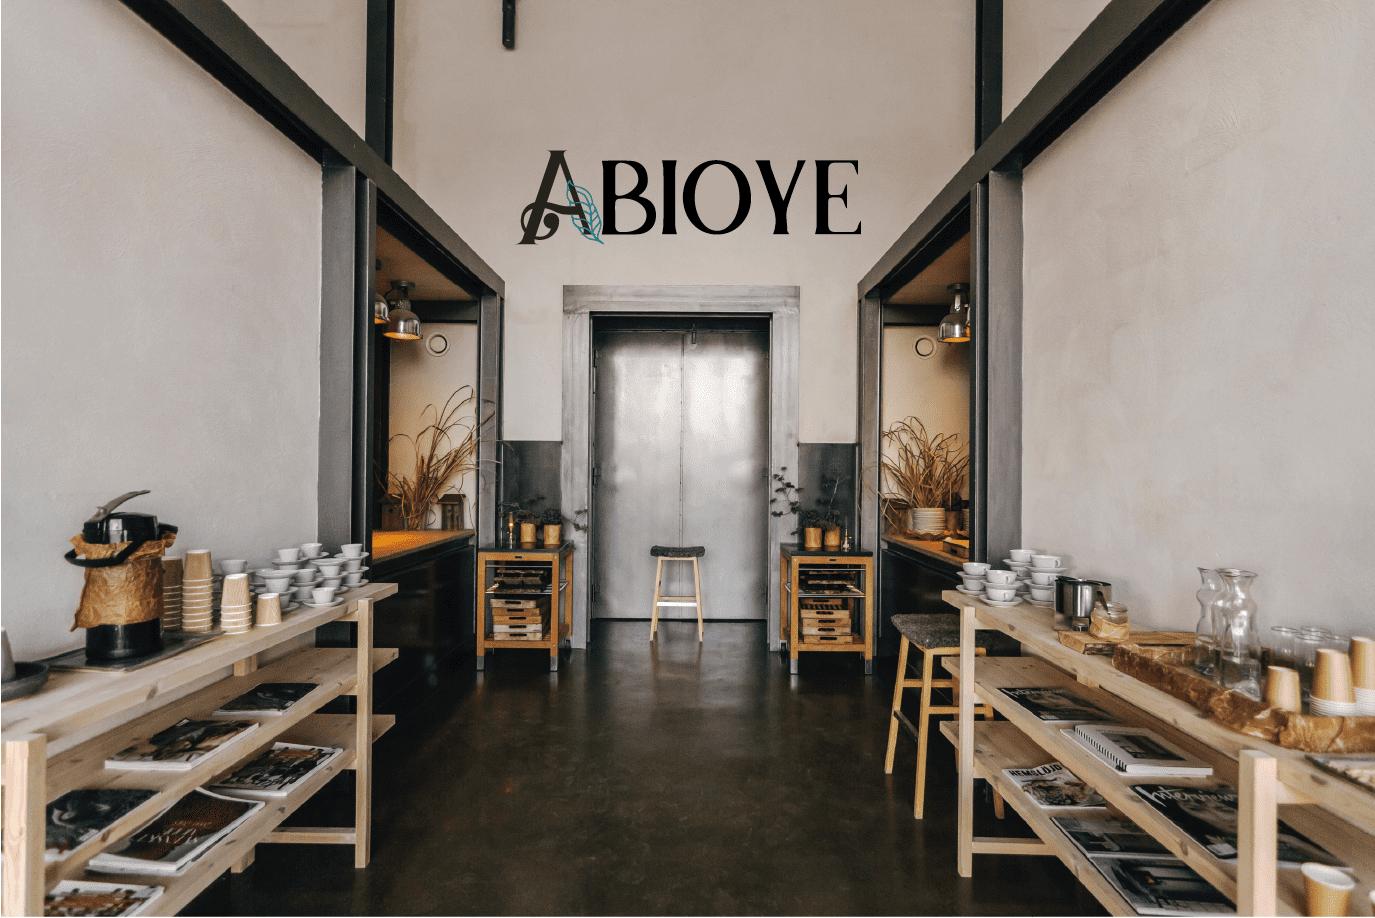 Abioye branding by Maria Wandiba